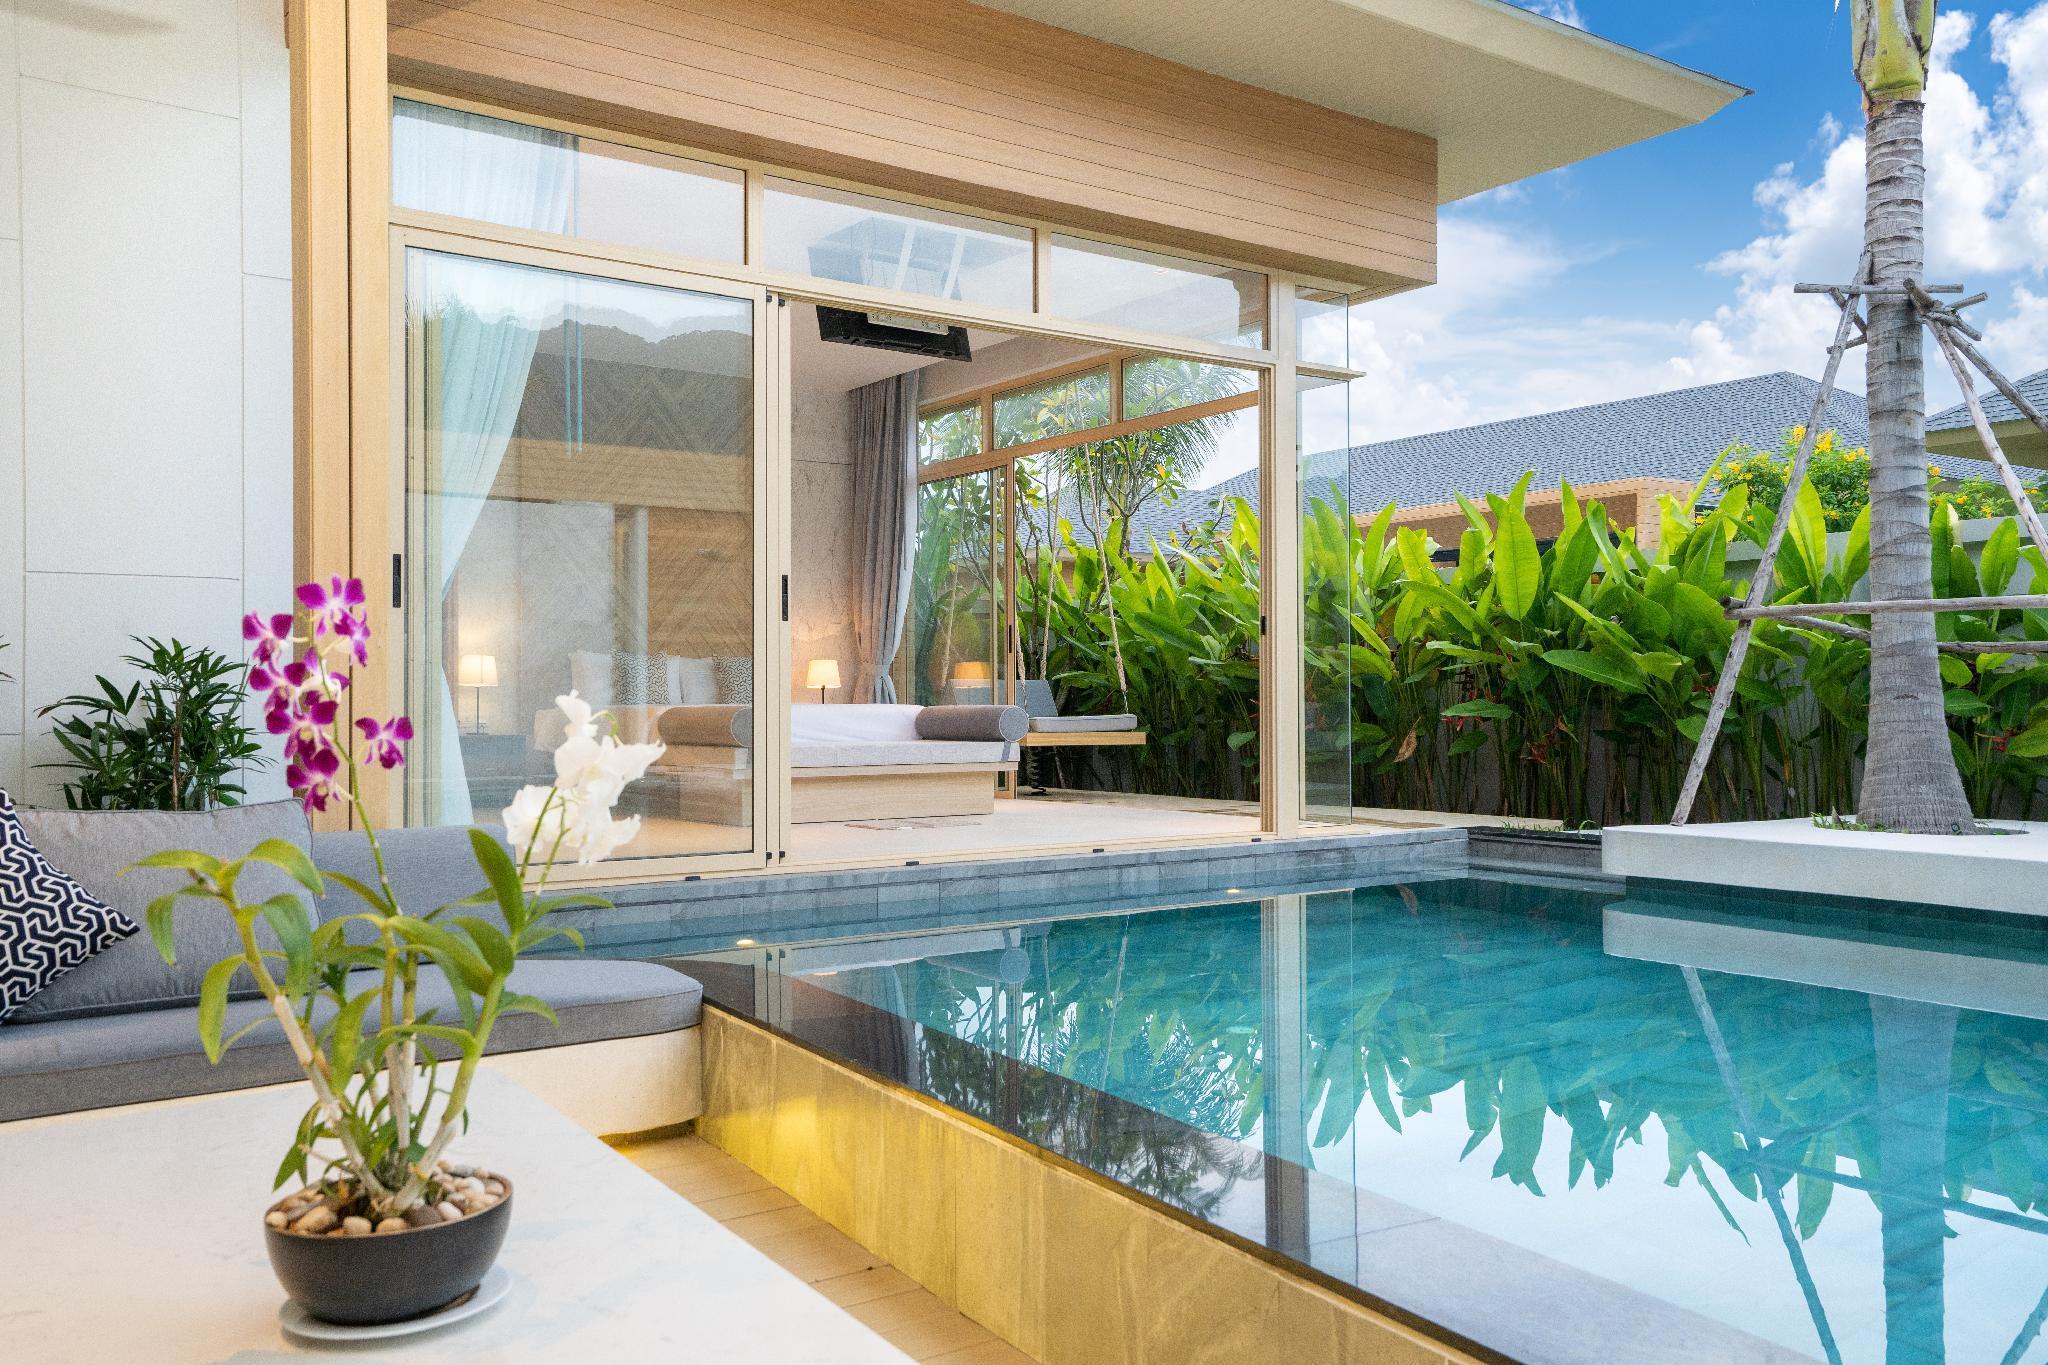 Himmapana Luxury 4 Bedroom Villa วิลลา 4 ห้องนอน 4 ห้องน้ำส่วนตัว ขนาด 200 ตร.ม. – กมลา